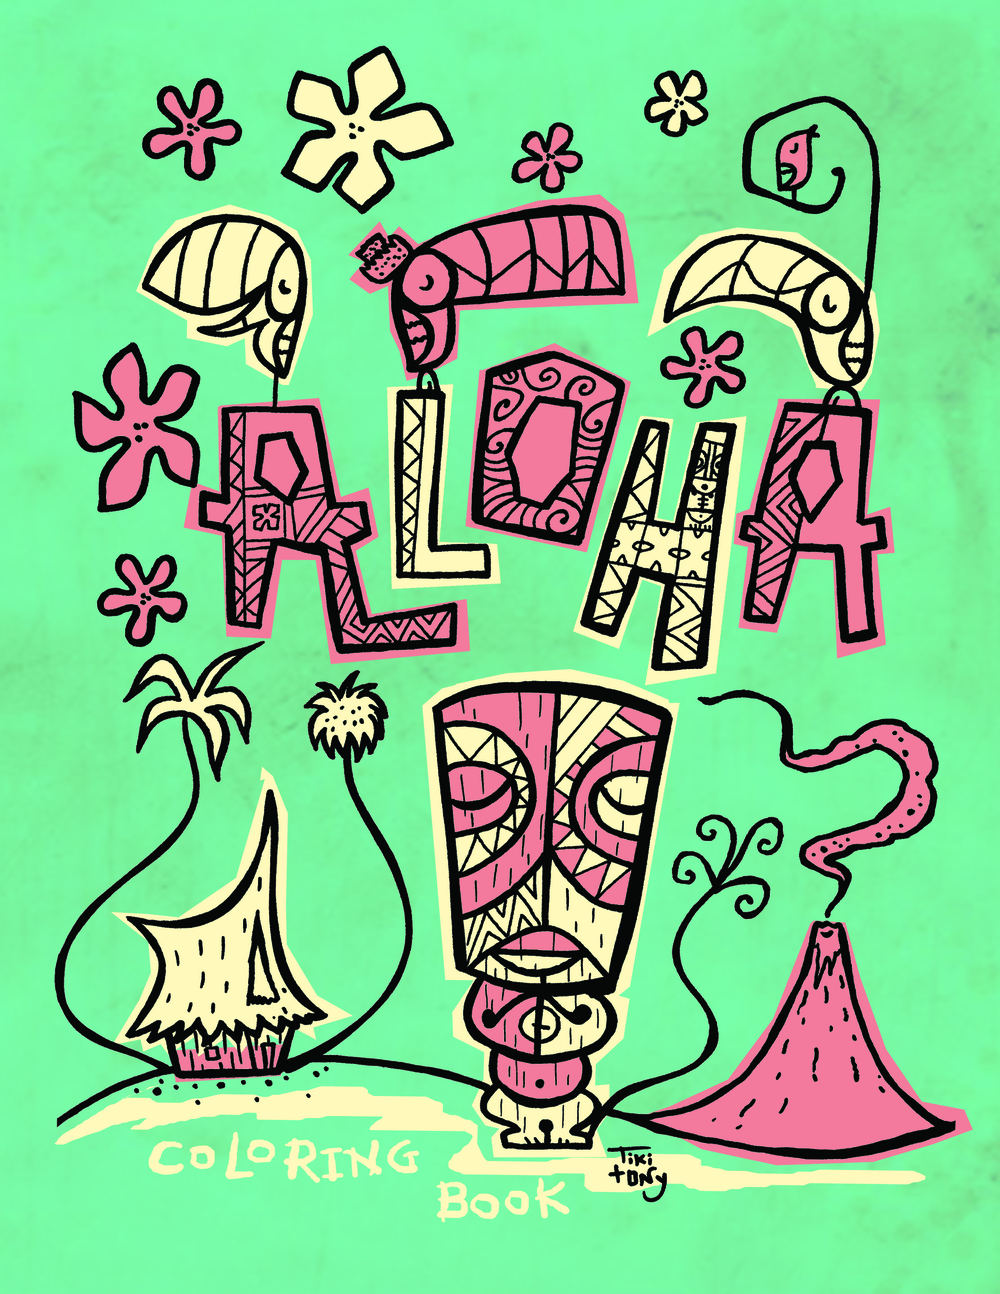 Tiki tOny Summer Digital Coloring Book 20 Pages! — Tiki tOny